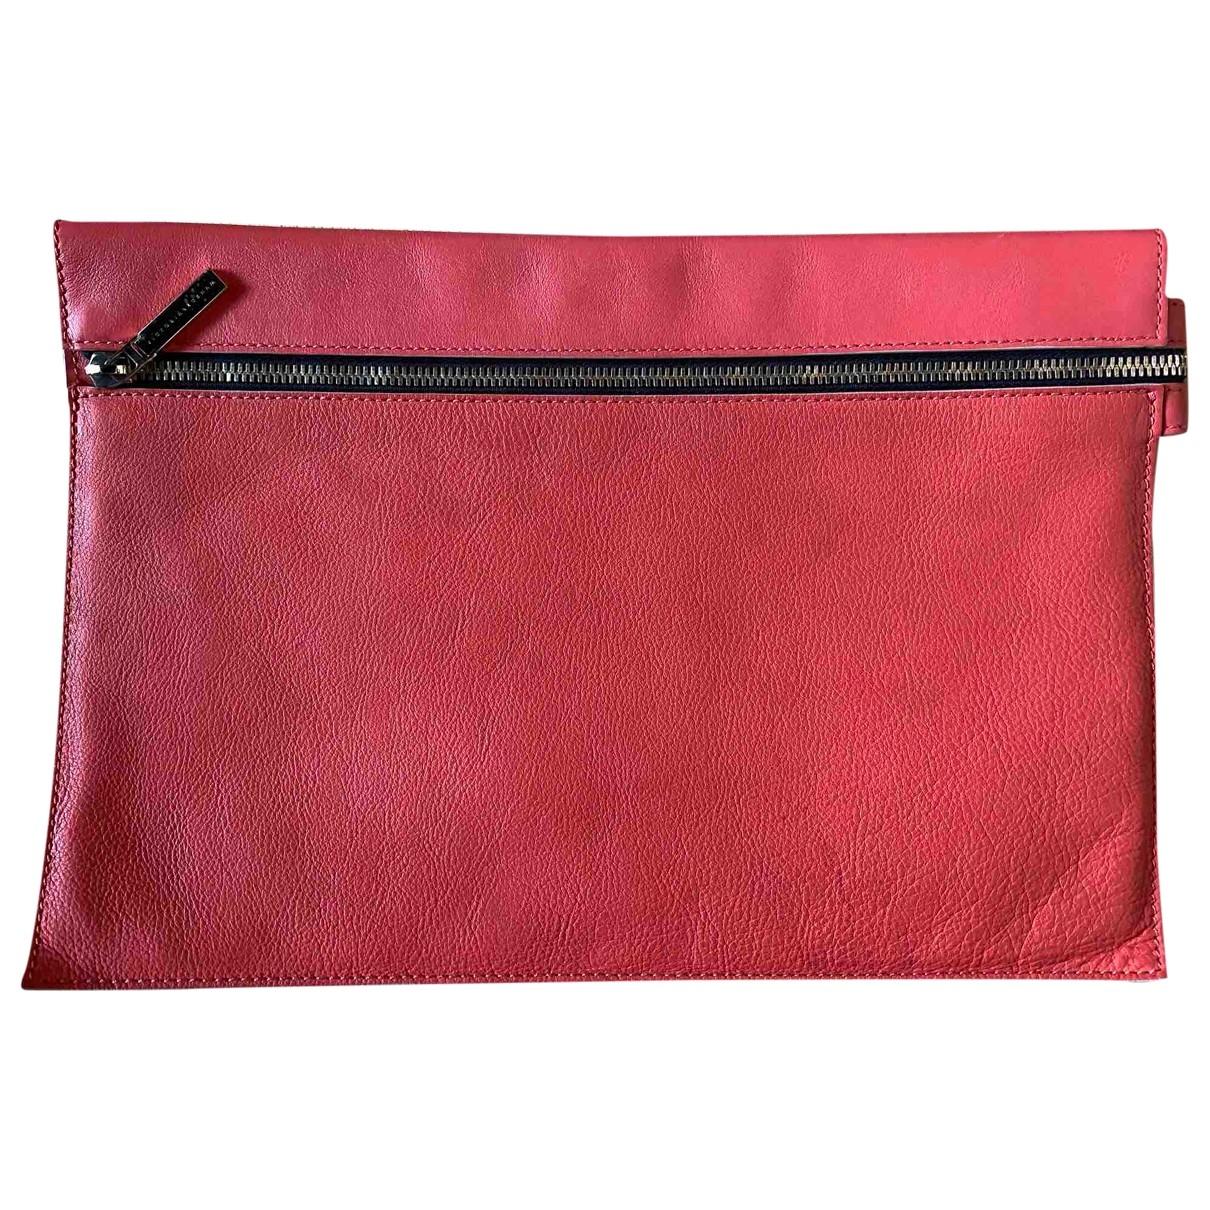 Victoria Beckham \N Leather Clutch bag for Women \N